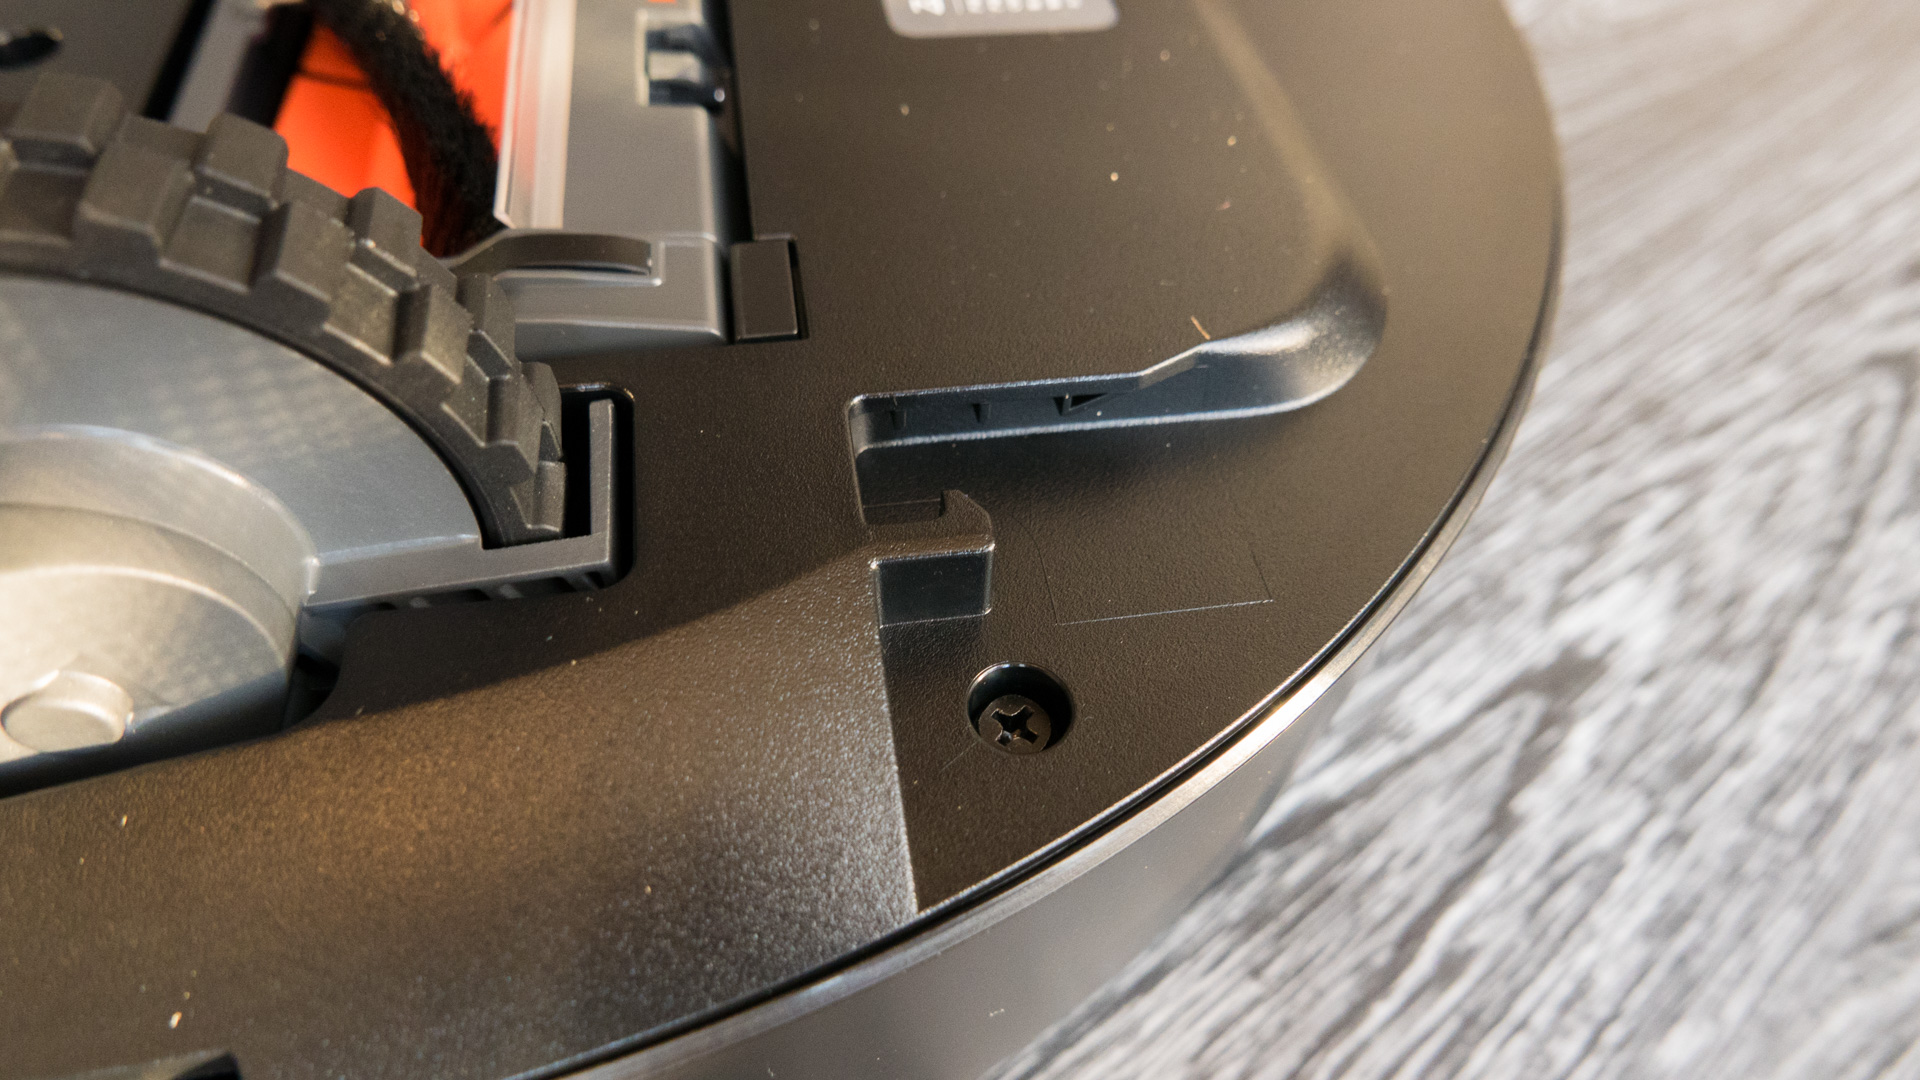 Xiaomi-roborock-S55-Details-19